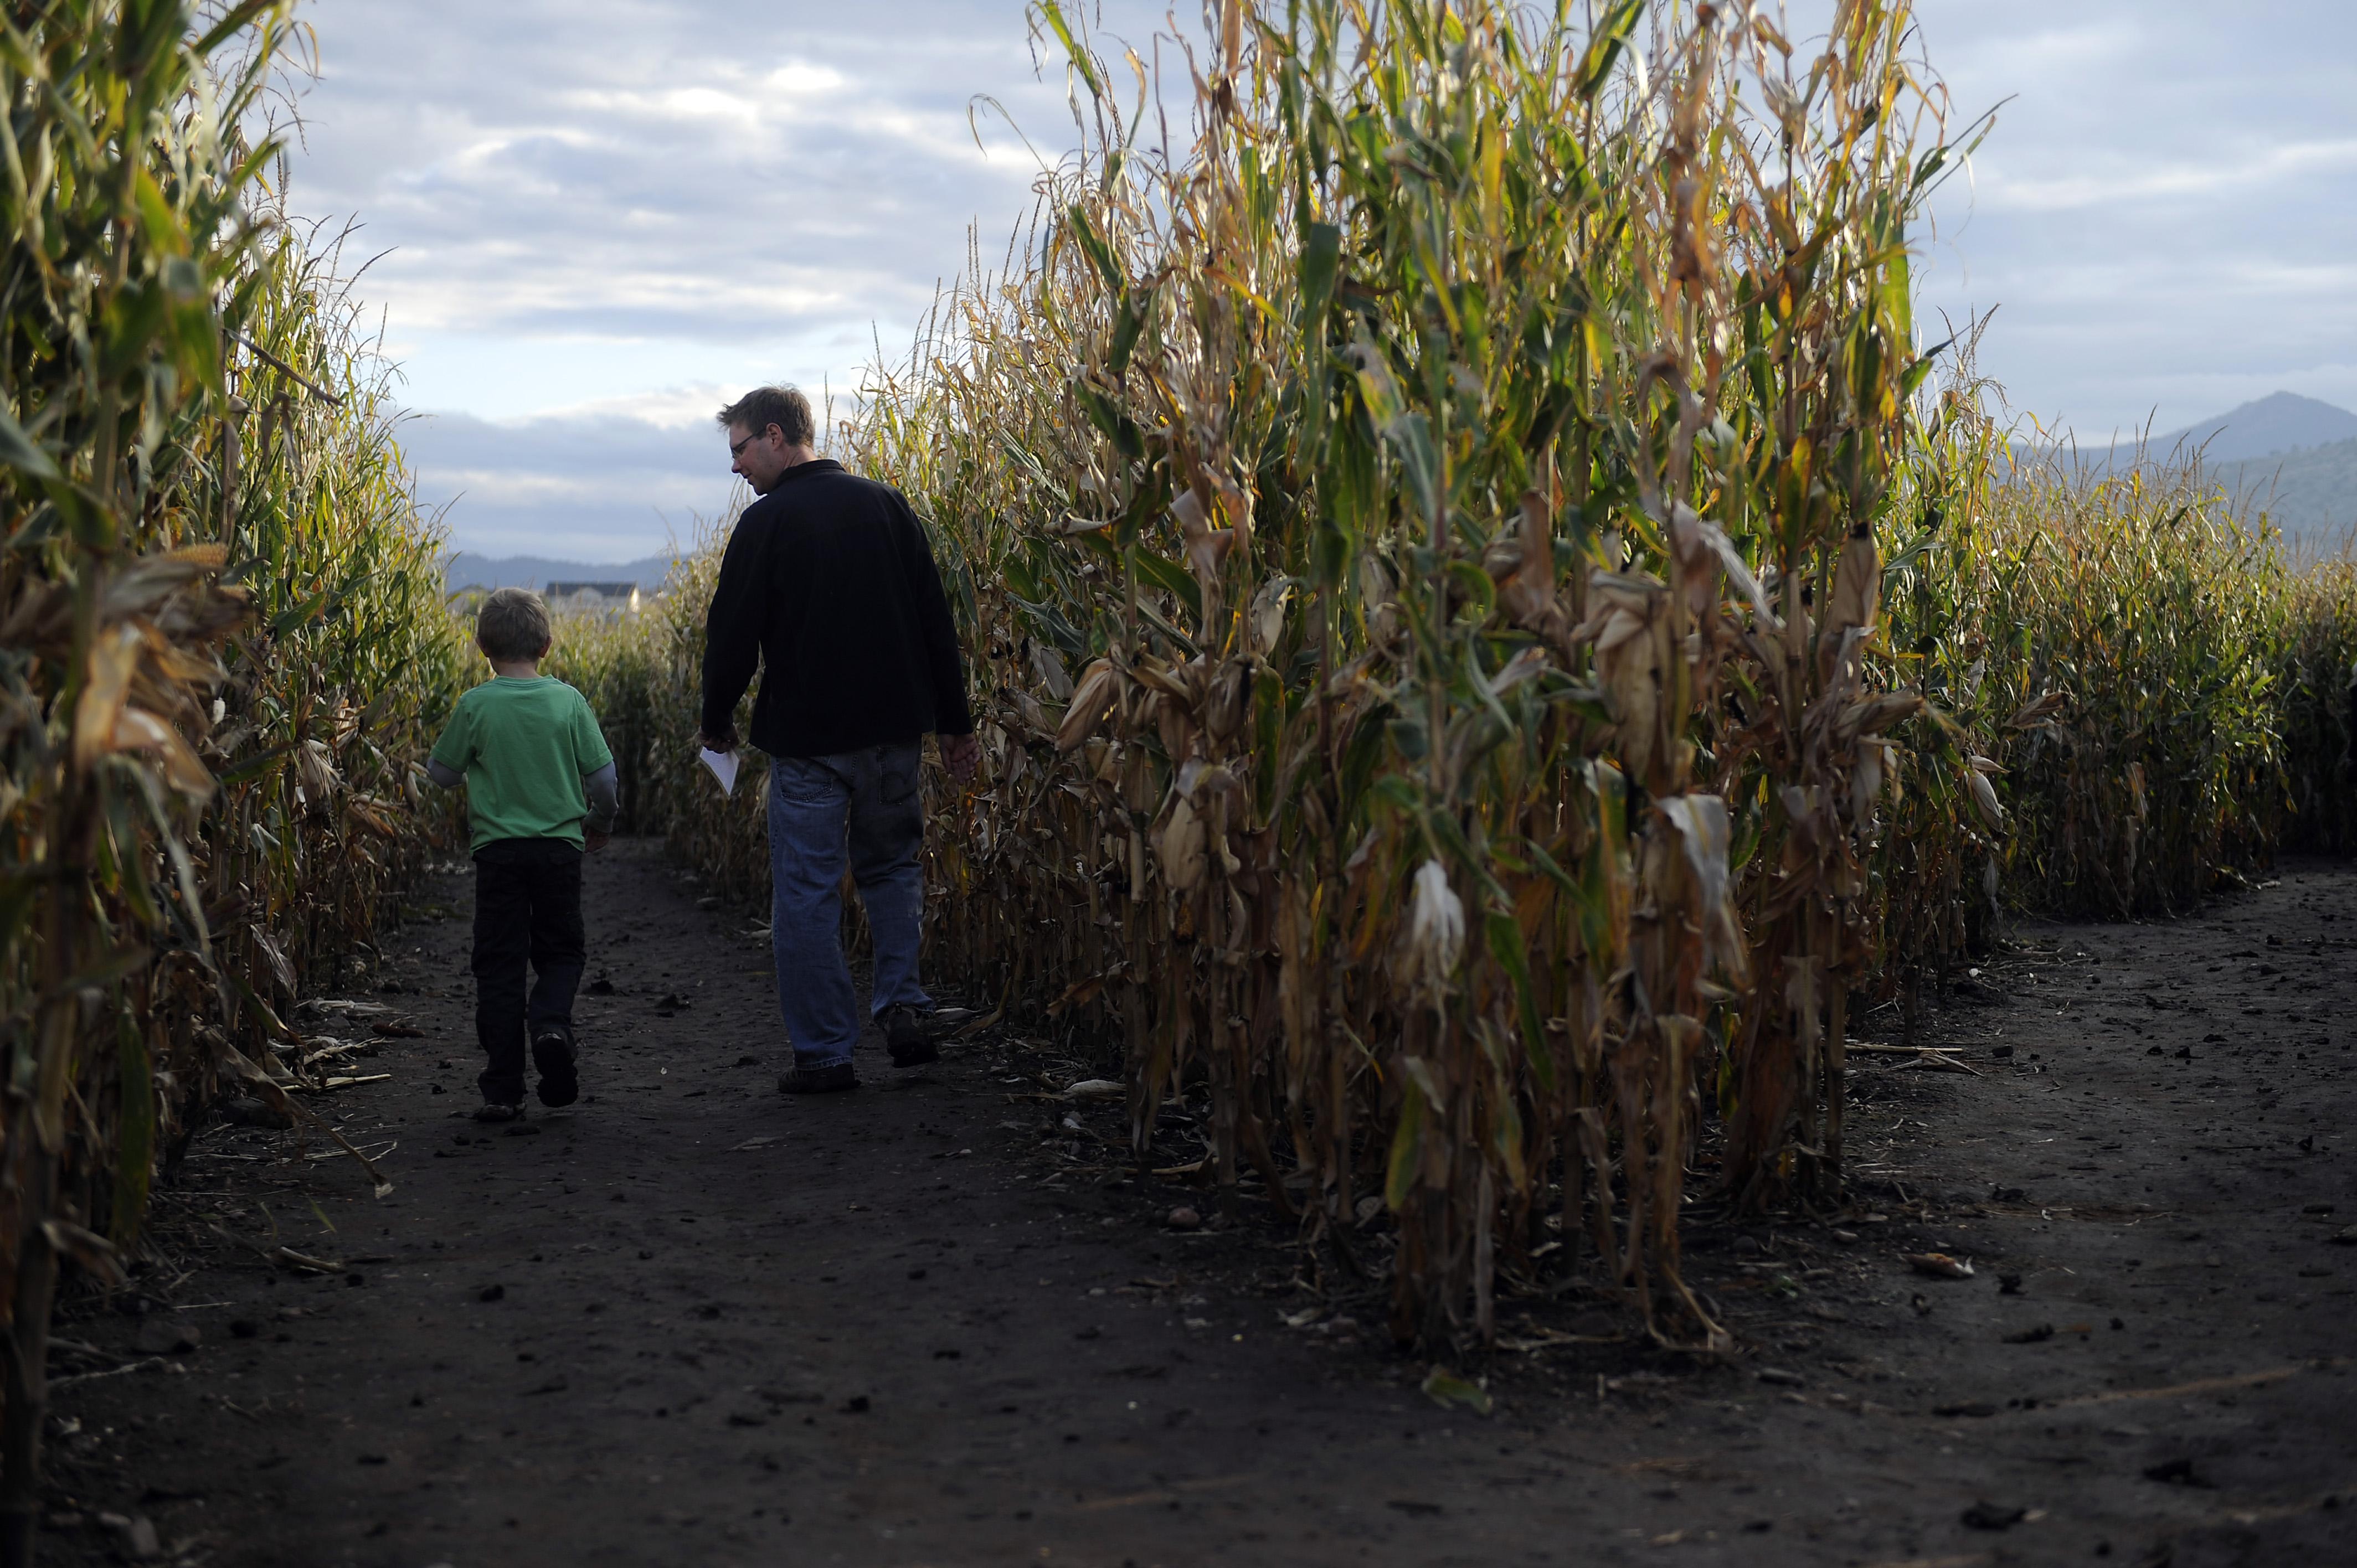 Jon Johnson And His Son, Ethan Johnson, 8, Wander The Corn Maze At